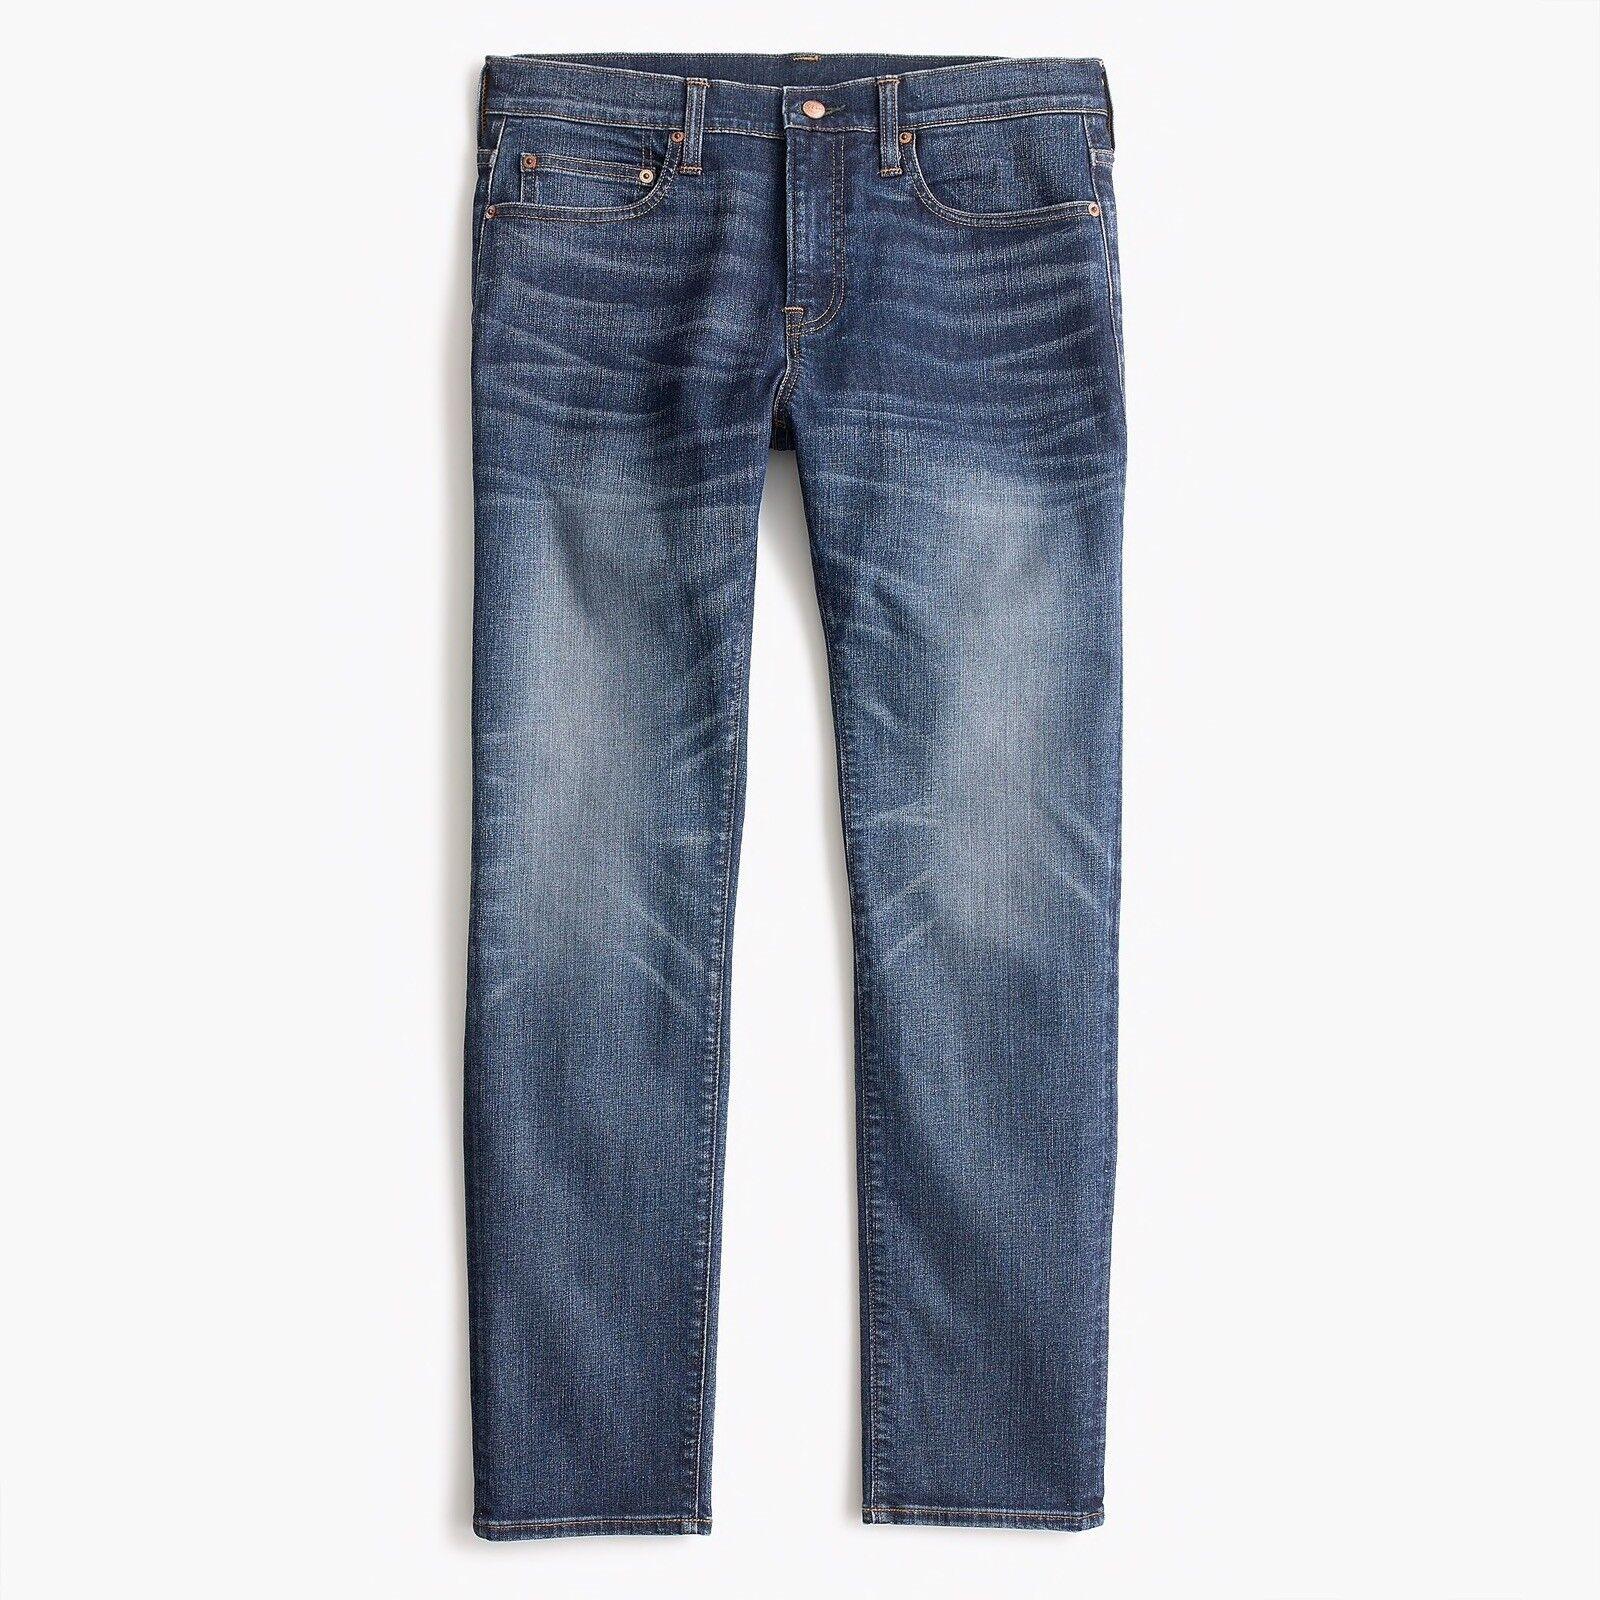 New J CREW 34 x 32 484 Slim-fit Stretch Jeans in Dalton Wash Item H7169